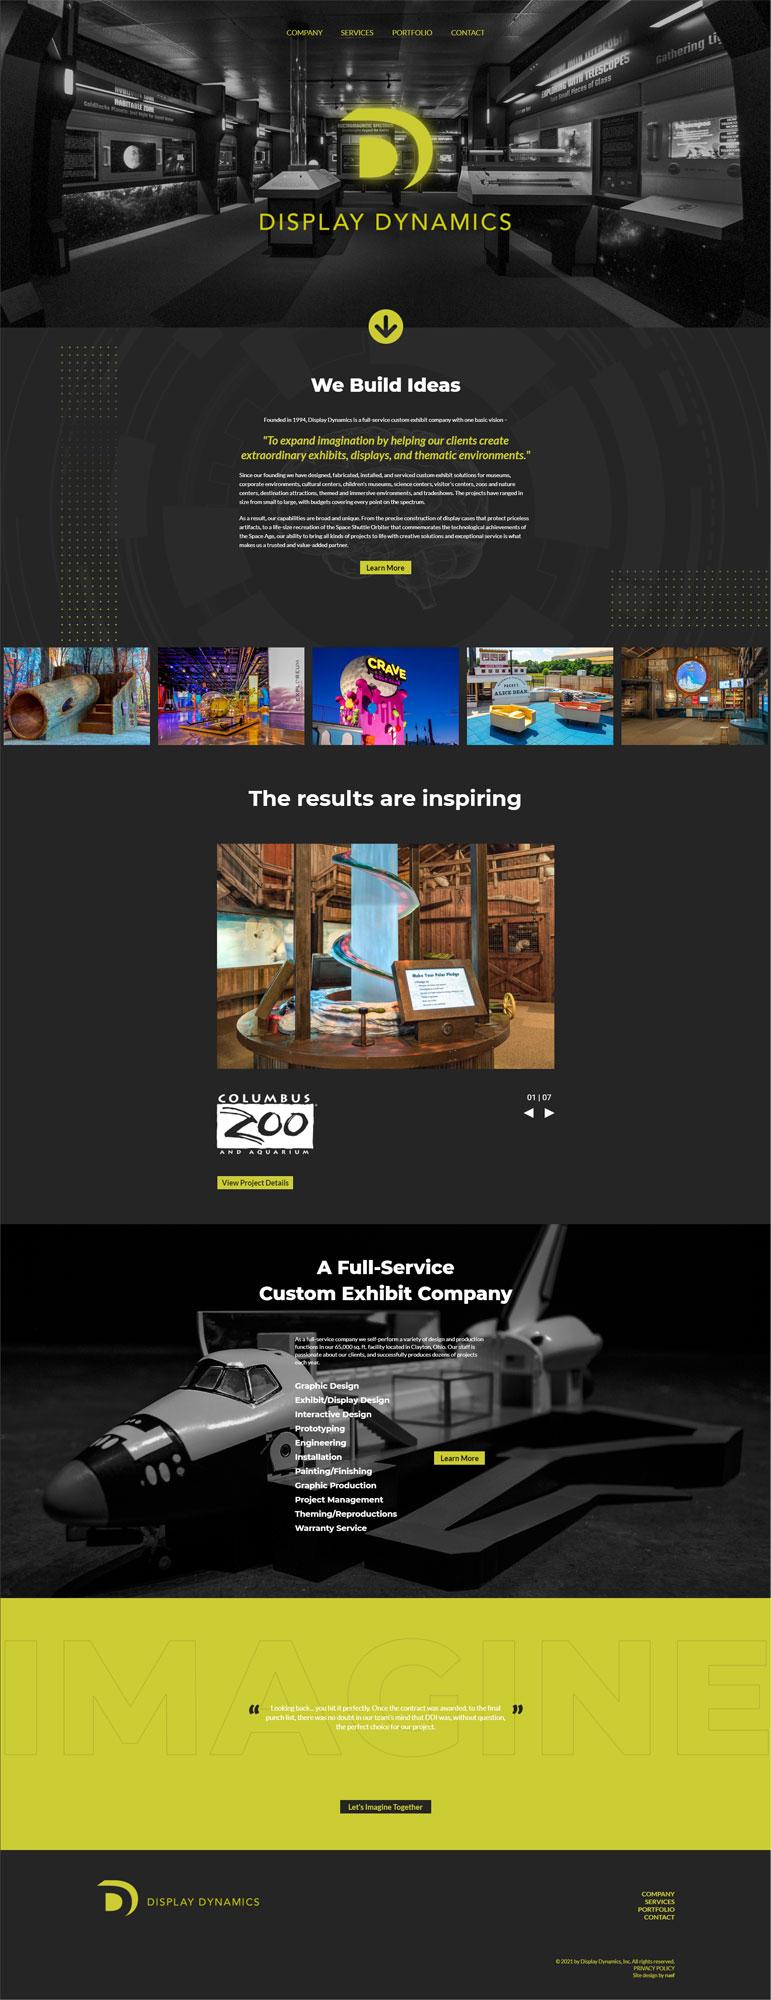 Display-Dynamics-Home-Page